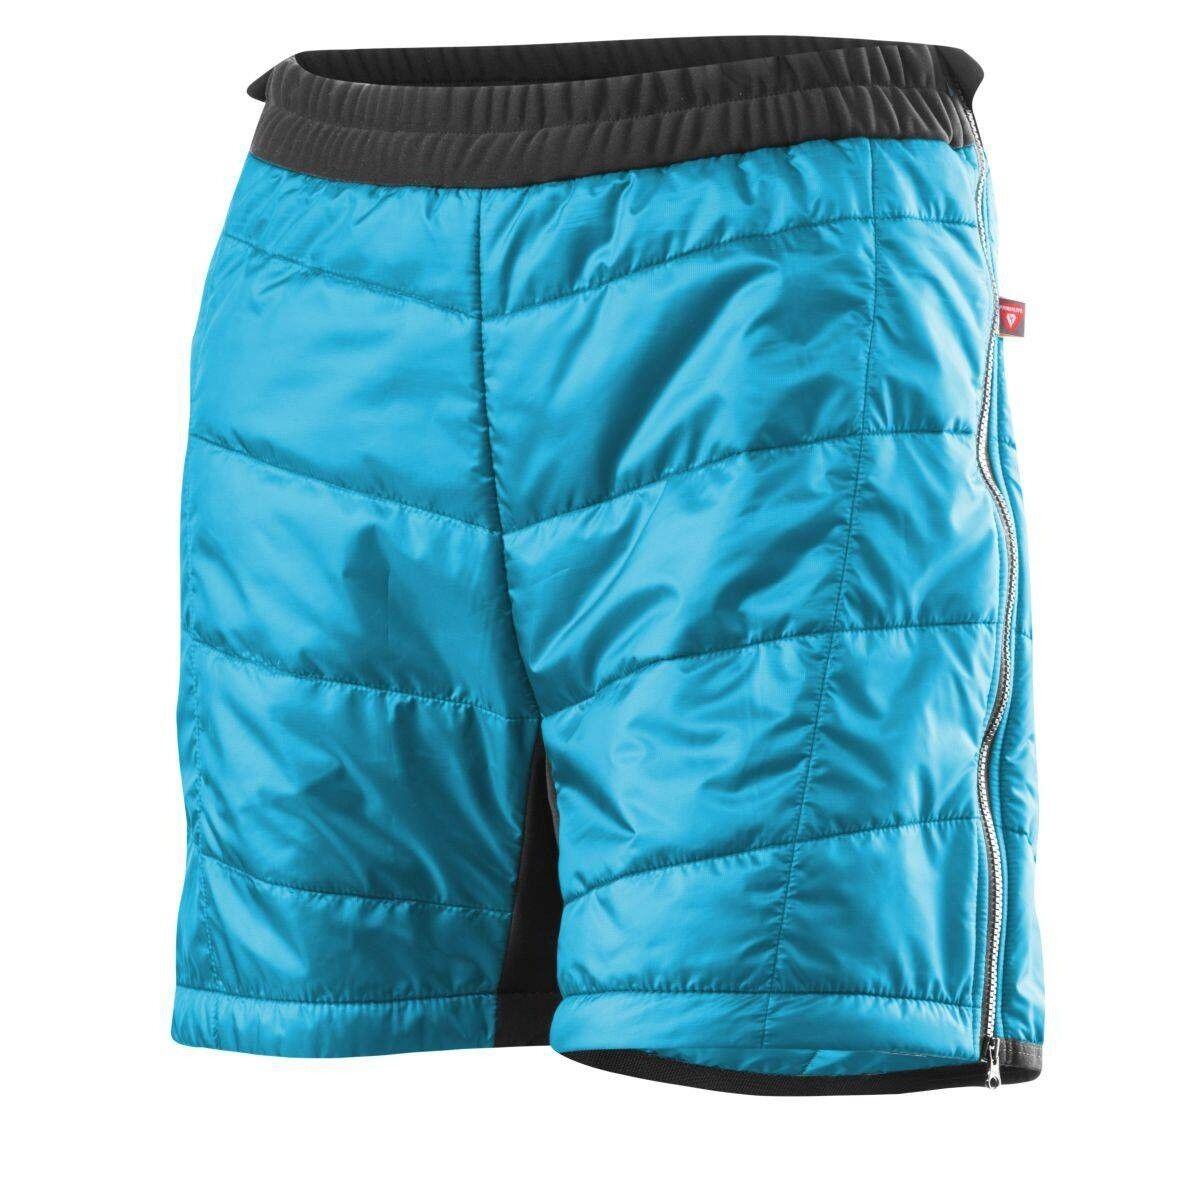 Löffler Shorts Primaloft Mix Damen kurze Funktionshose blau